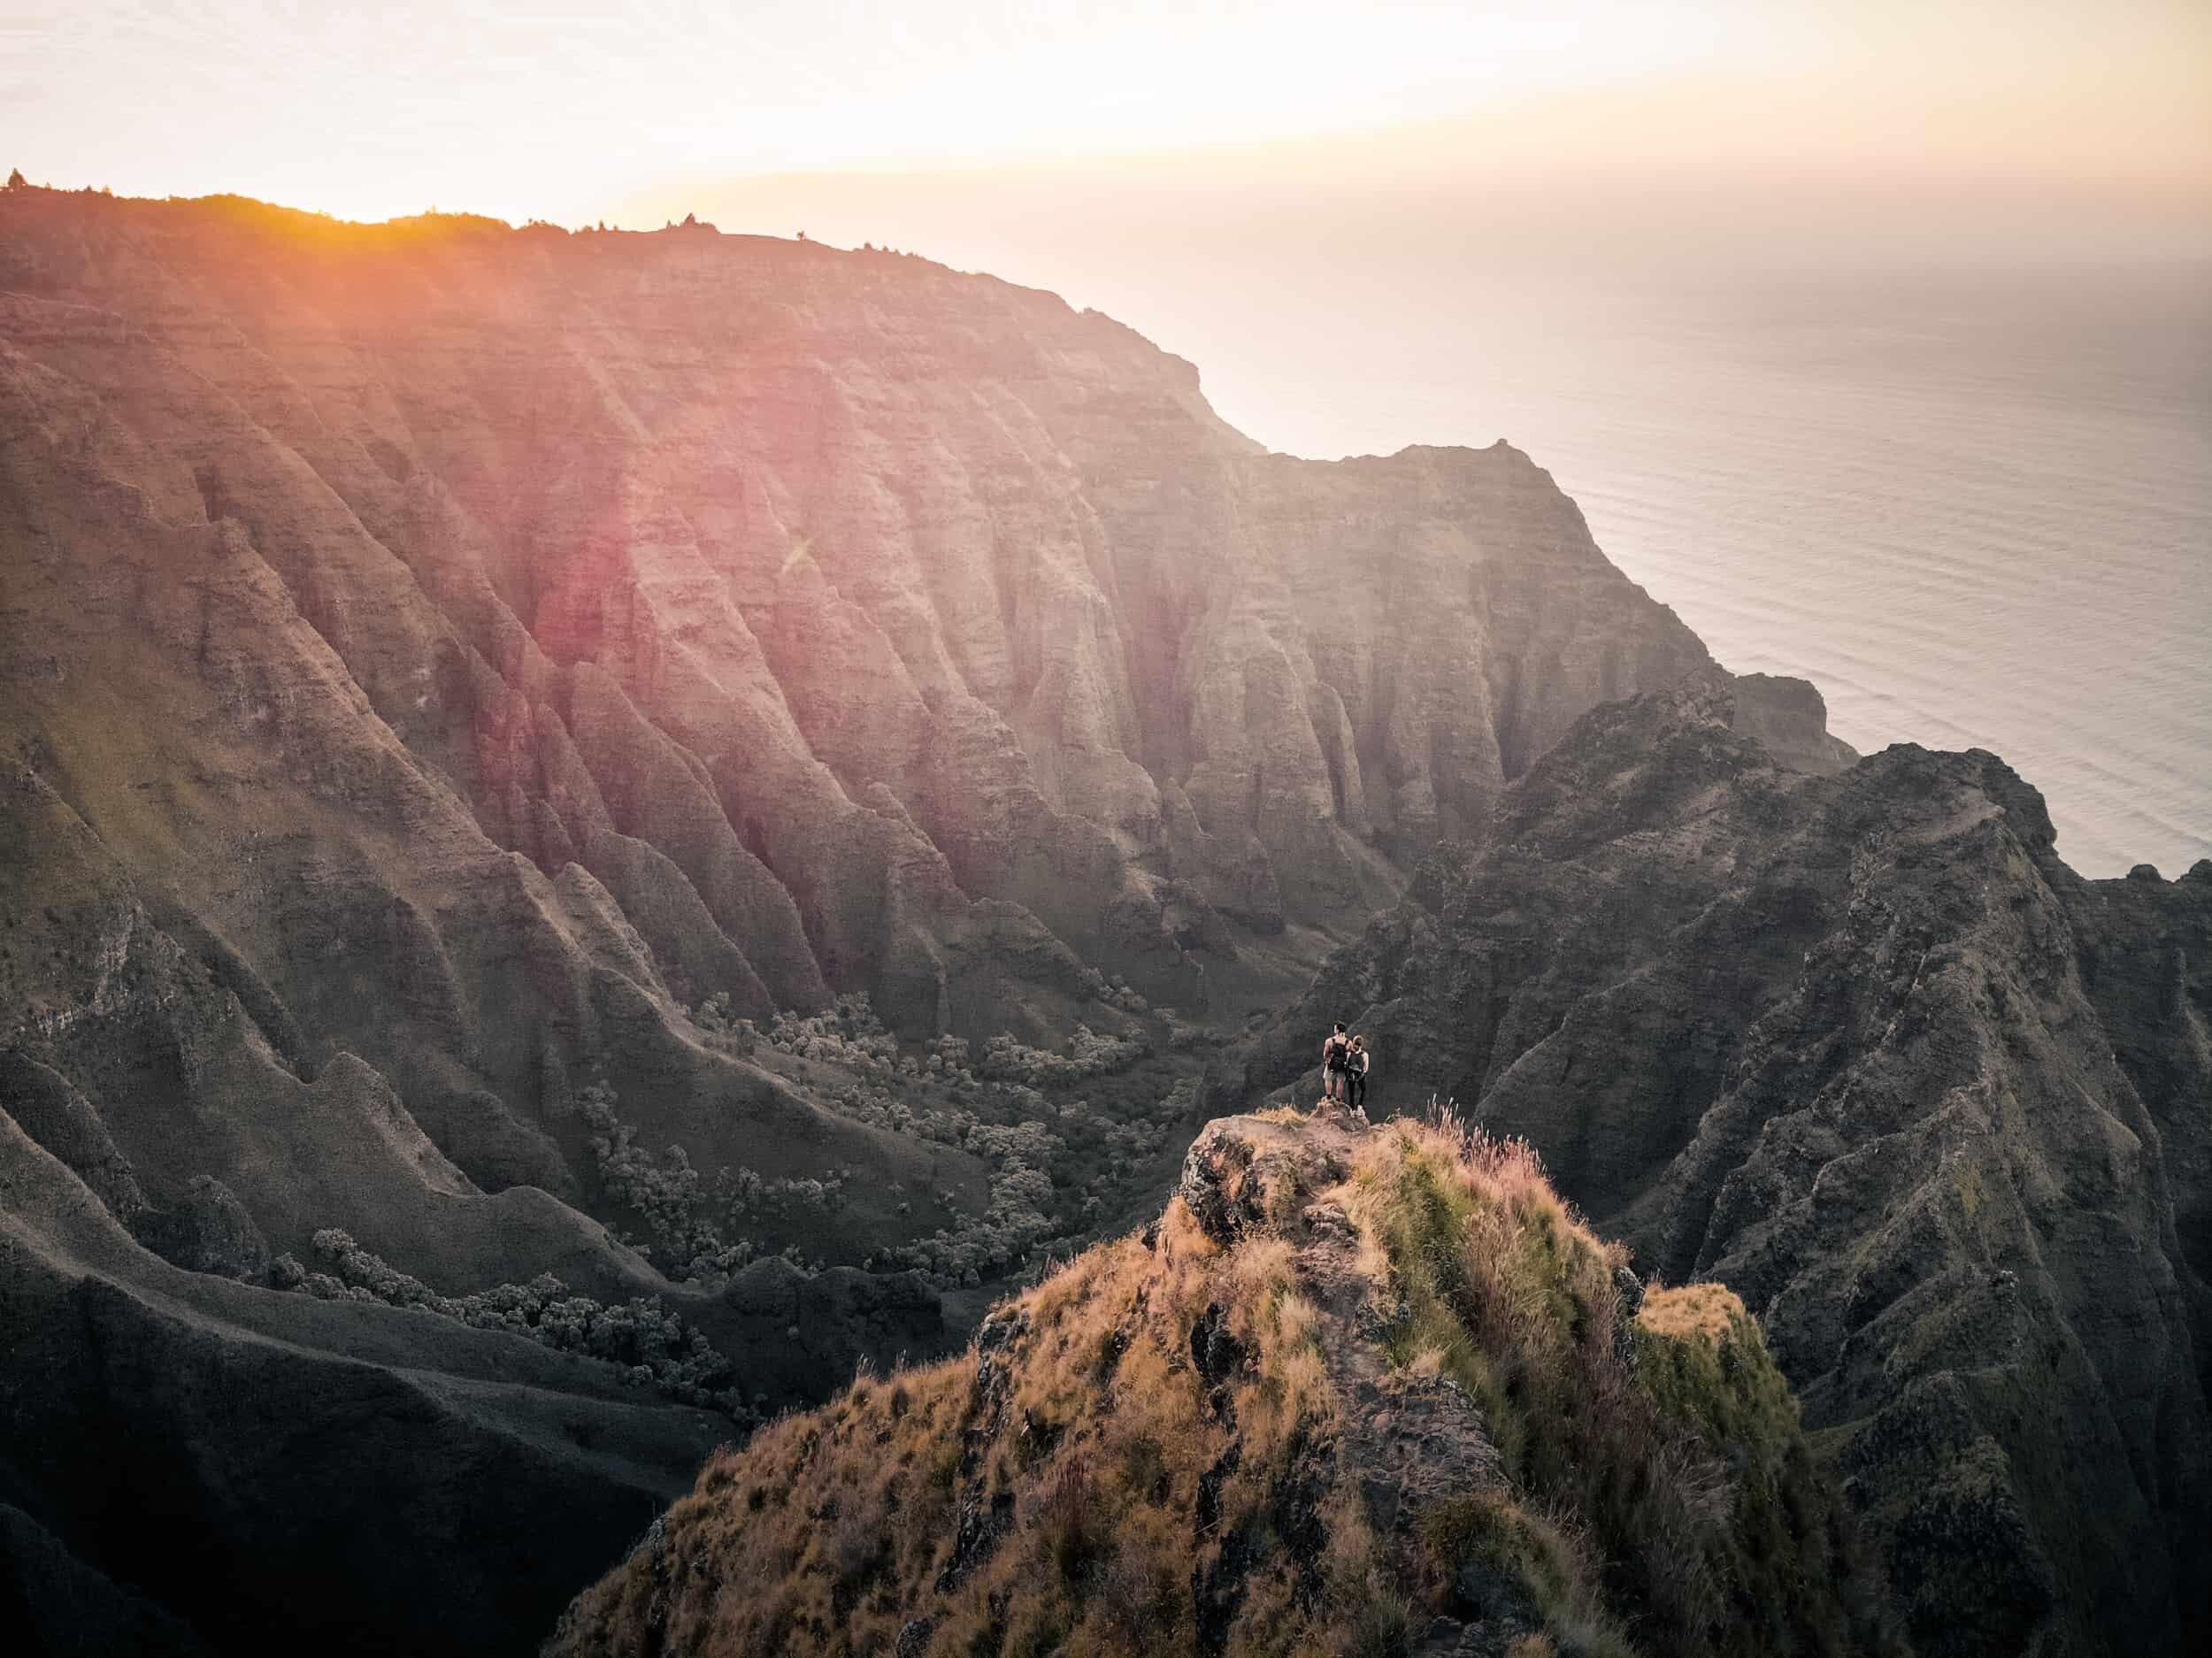 Awaawapuhi Trail, Kauai Elopement locations 2